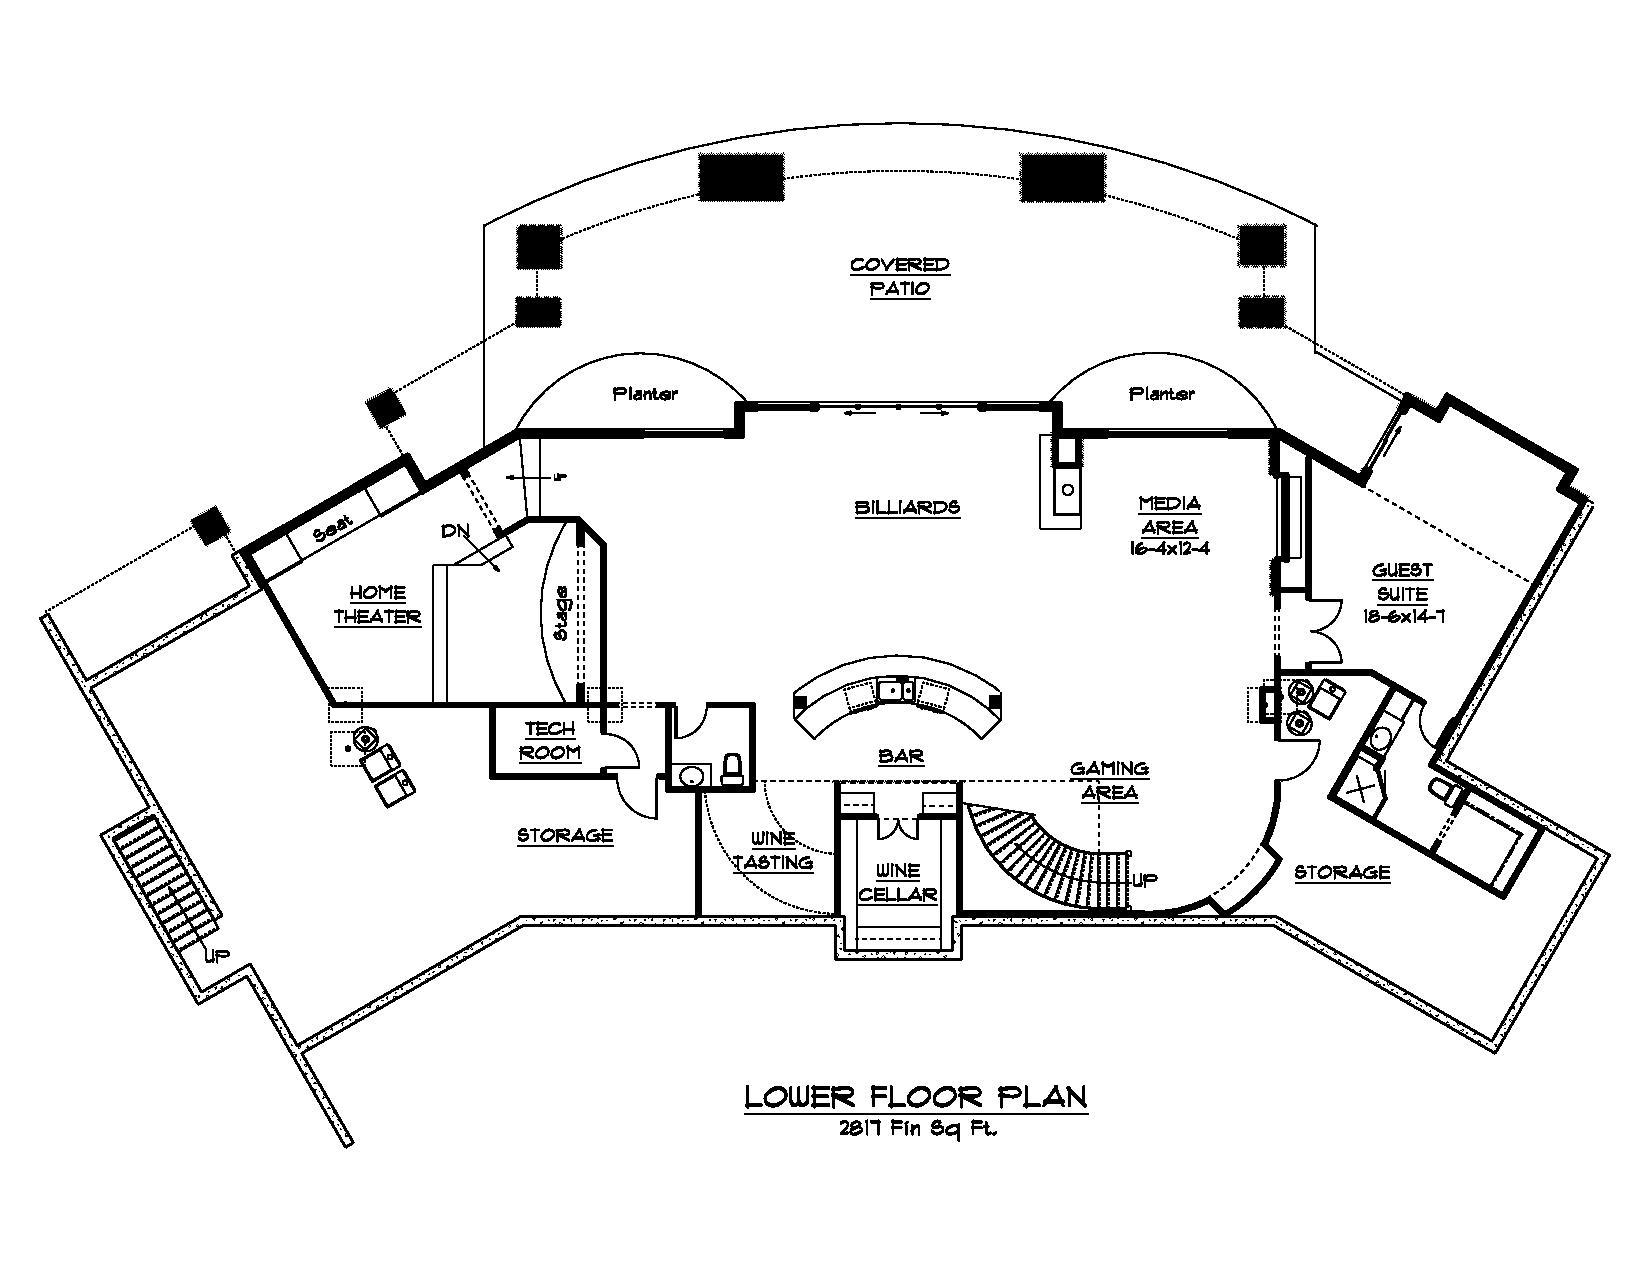 Craftsman Floor Plans With Basement: Luxury Craftsman Home Plan With 4 Bedrooms